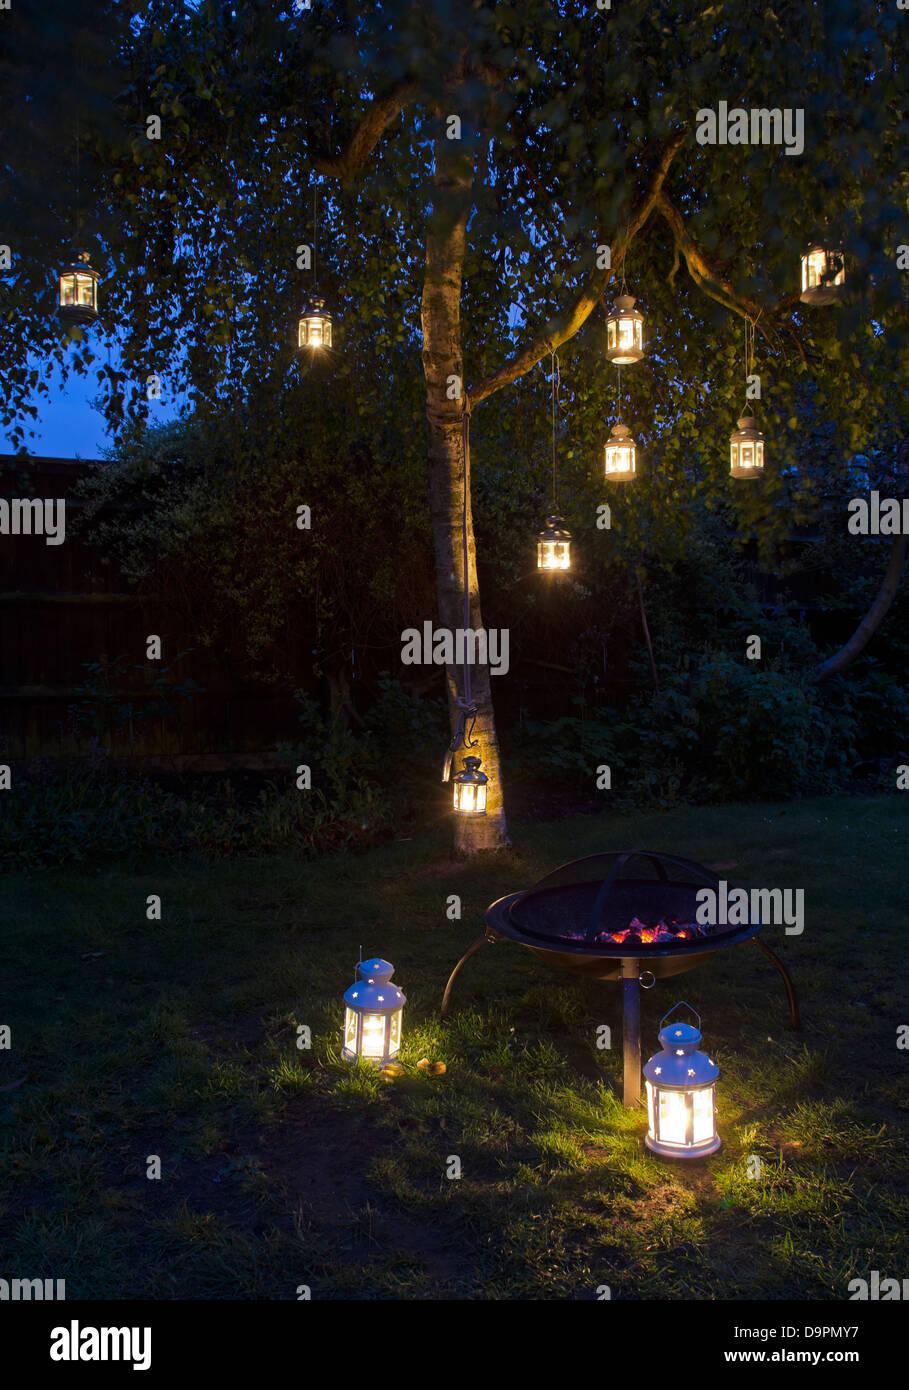 lanterns in garden tree - Stock Image